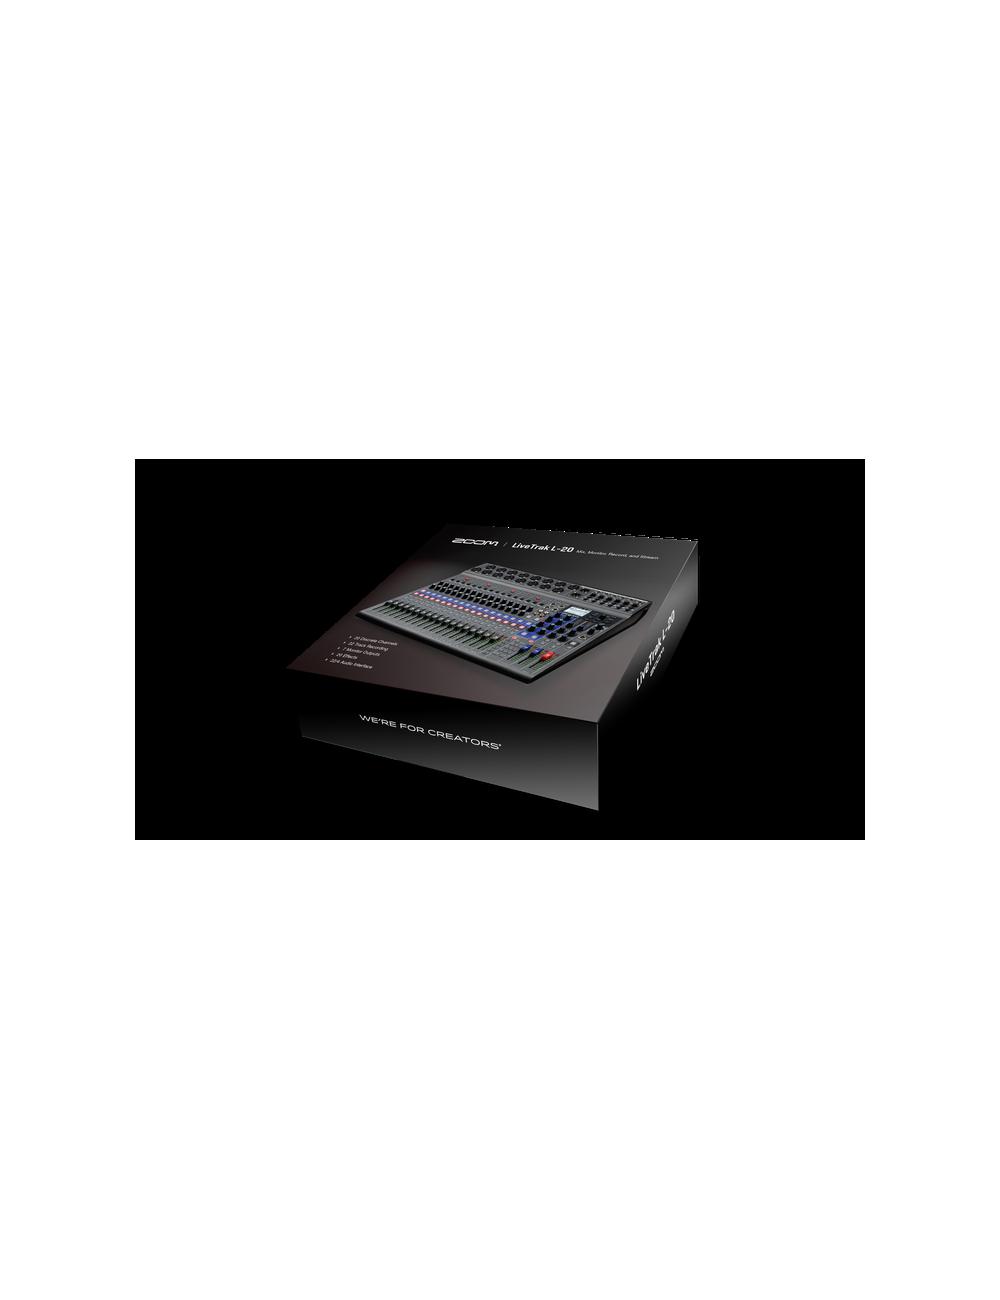 Godox S45T Flash Esclavo de Estudio 45w con base E27 (como ampolleta)